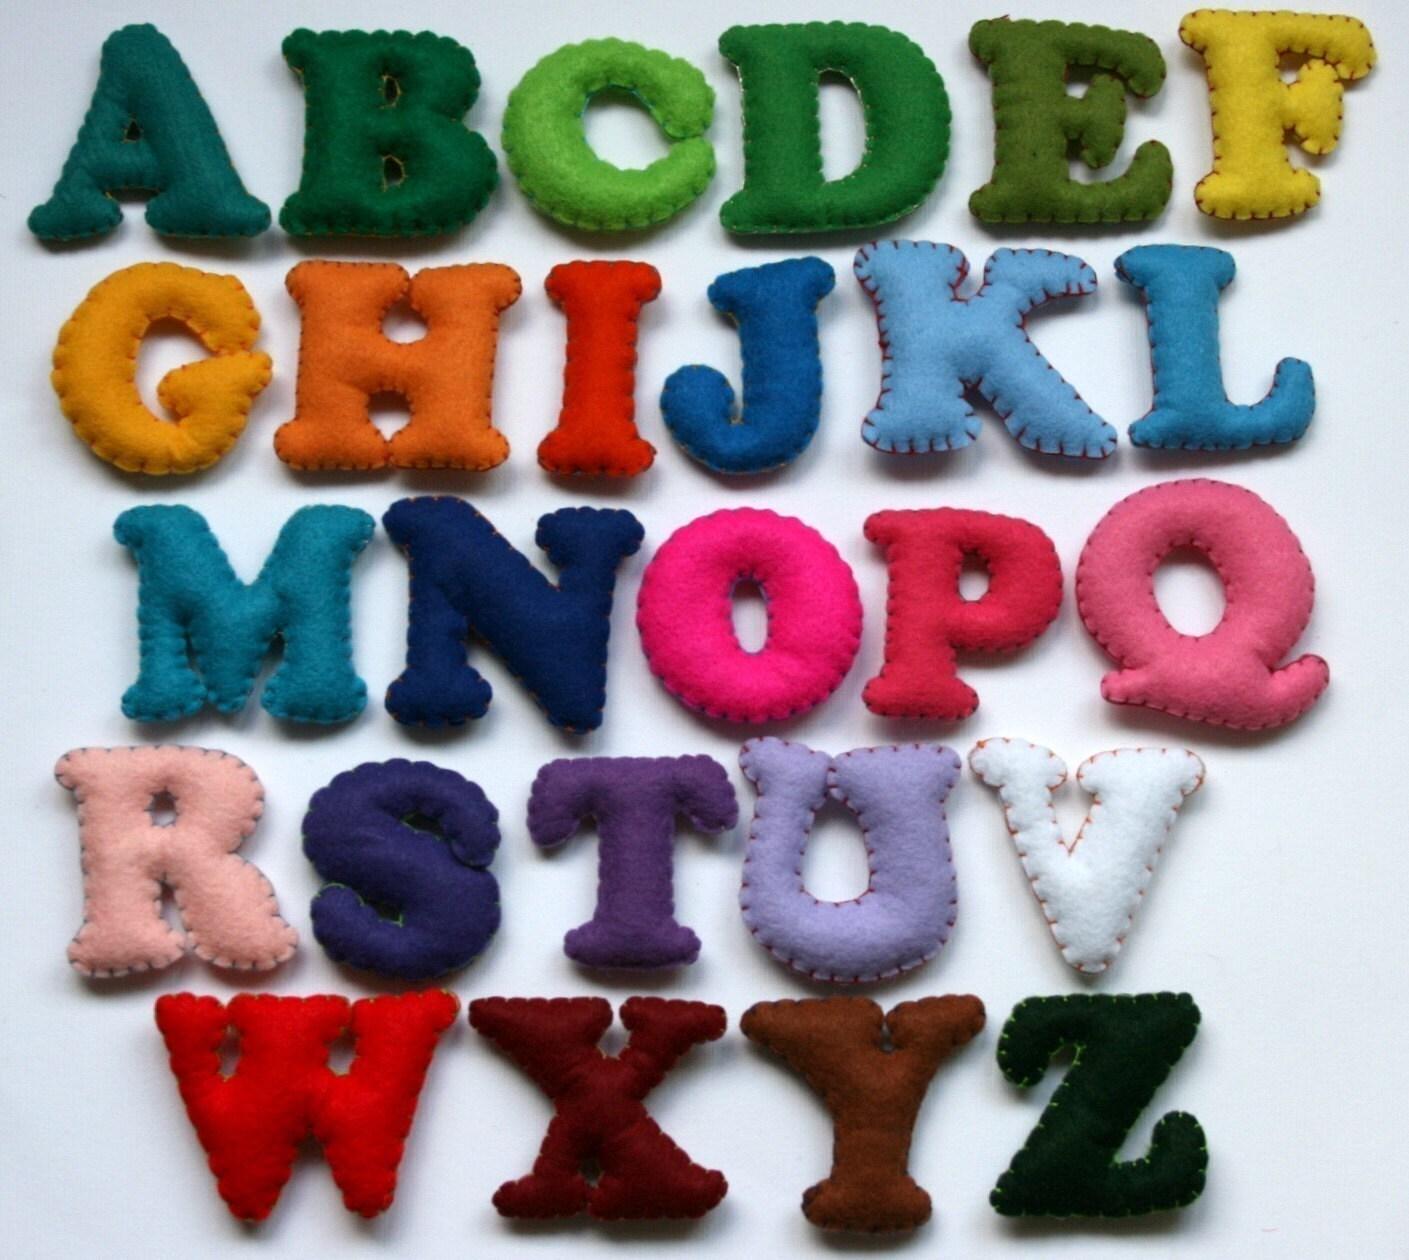 alphabet set 26 stuffed felt letters upper case fancy With stuffed felt alphabet letters